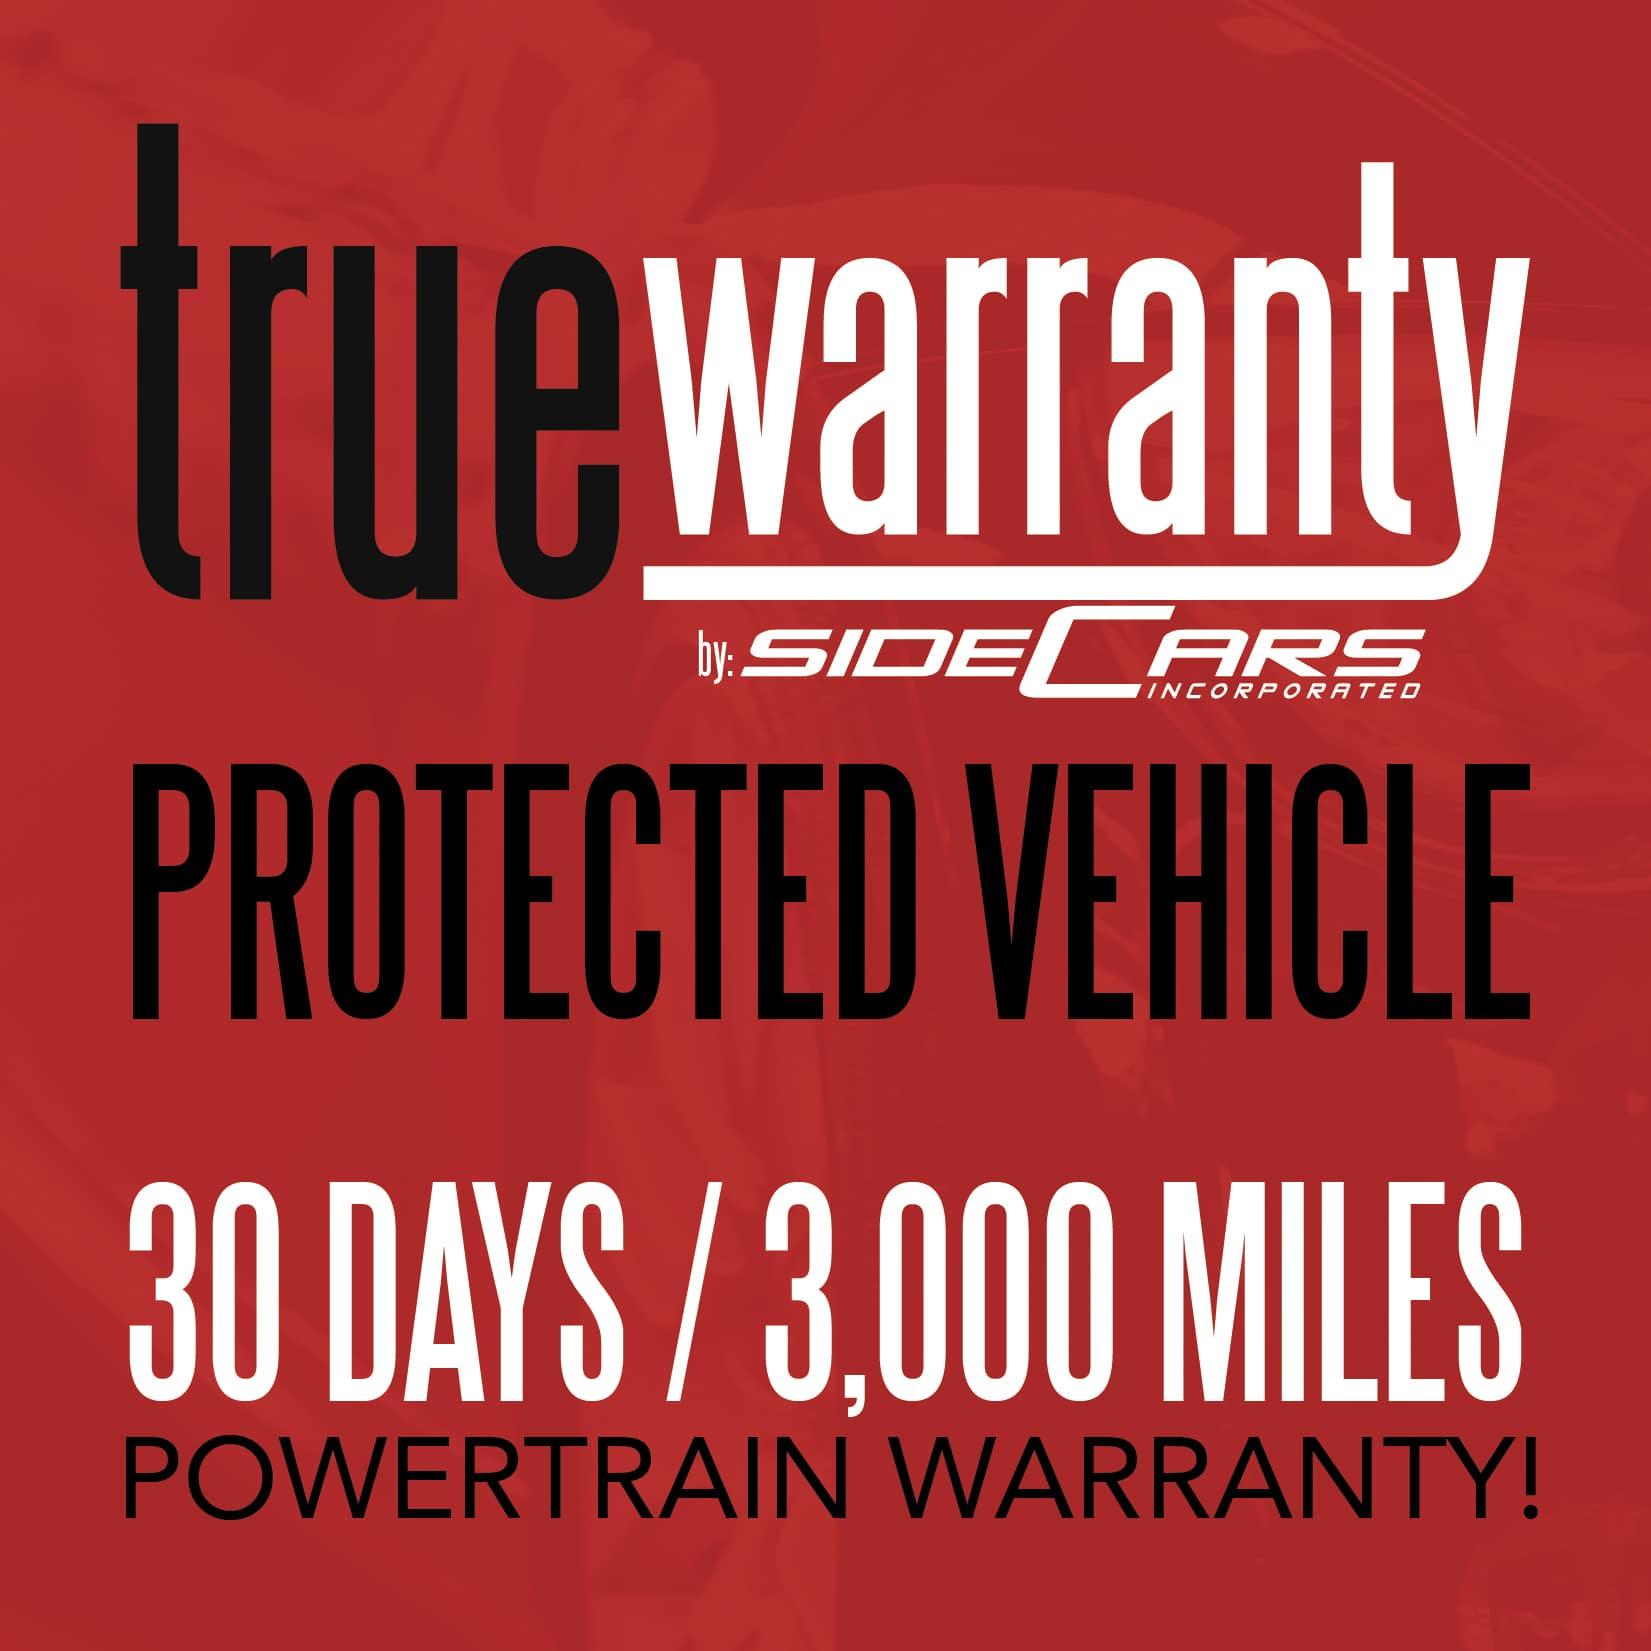 warranty-image-kareem-auto